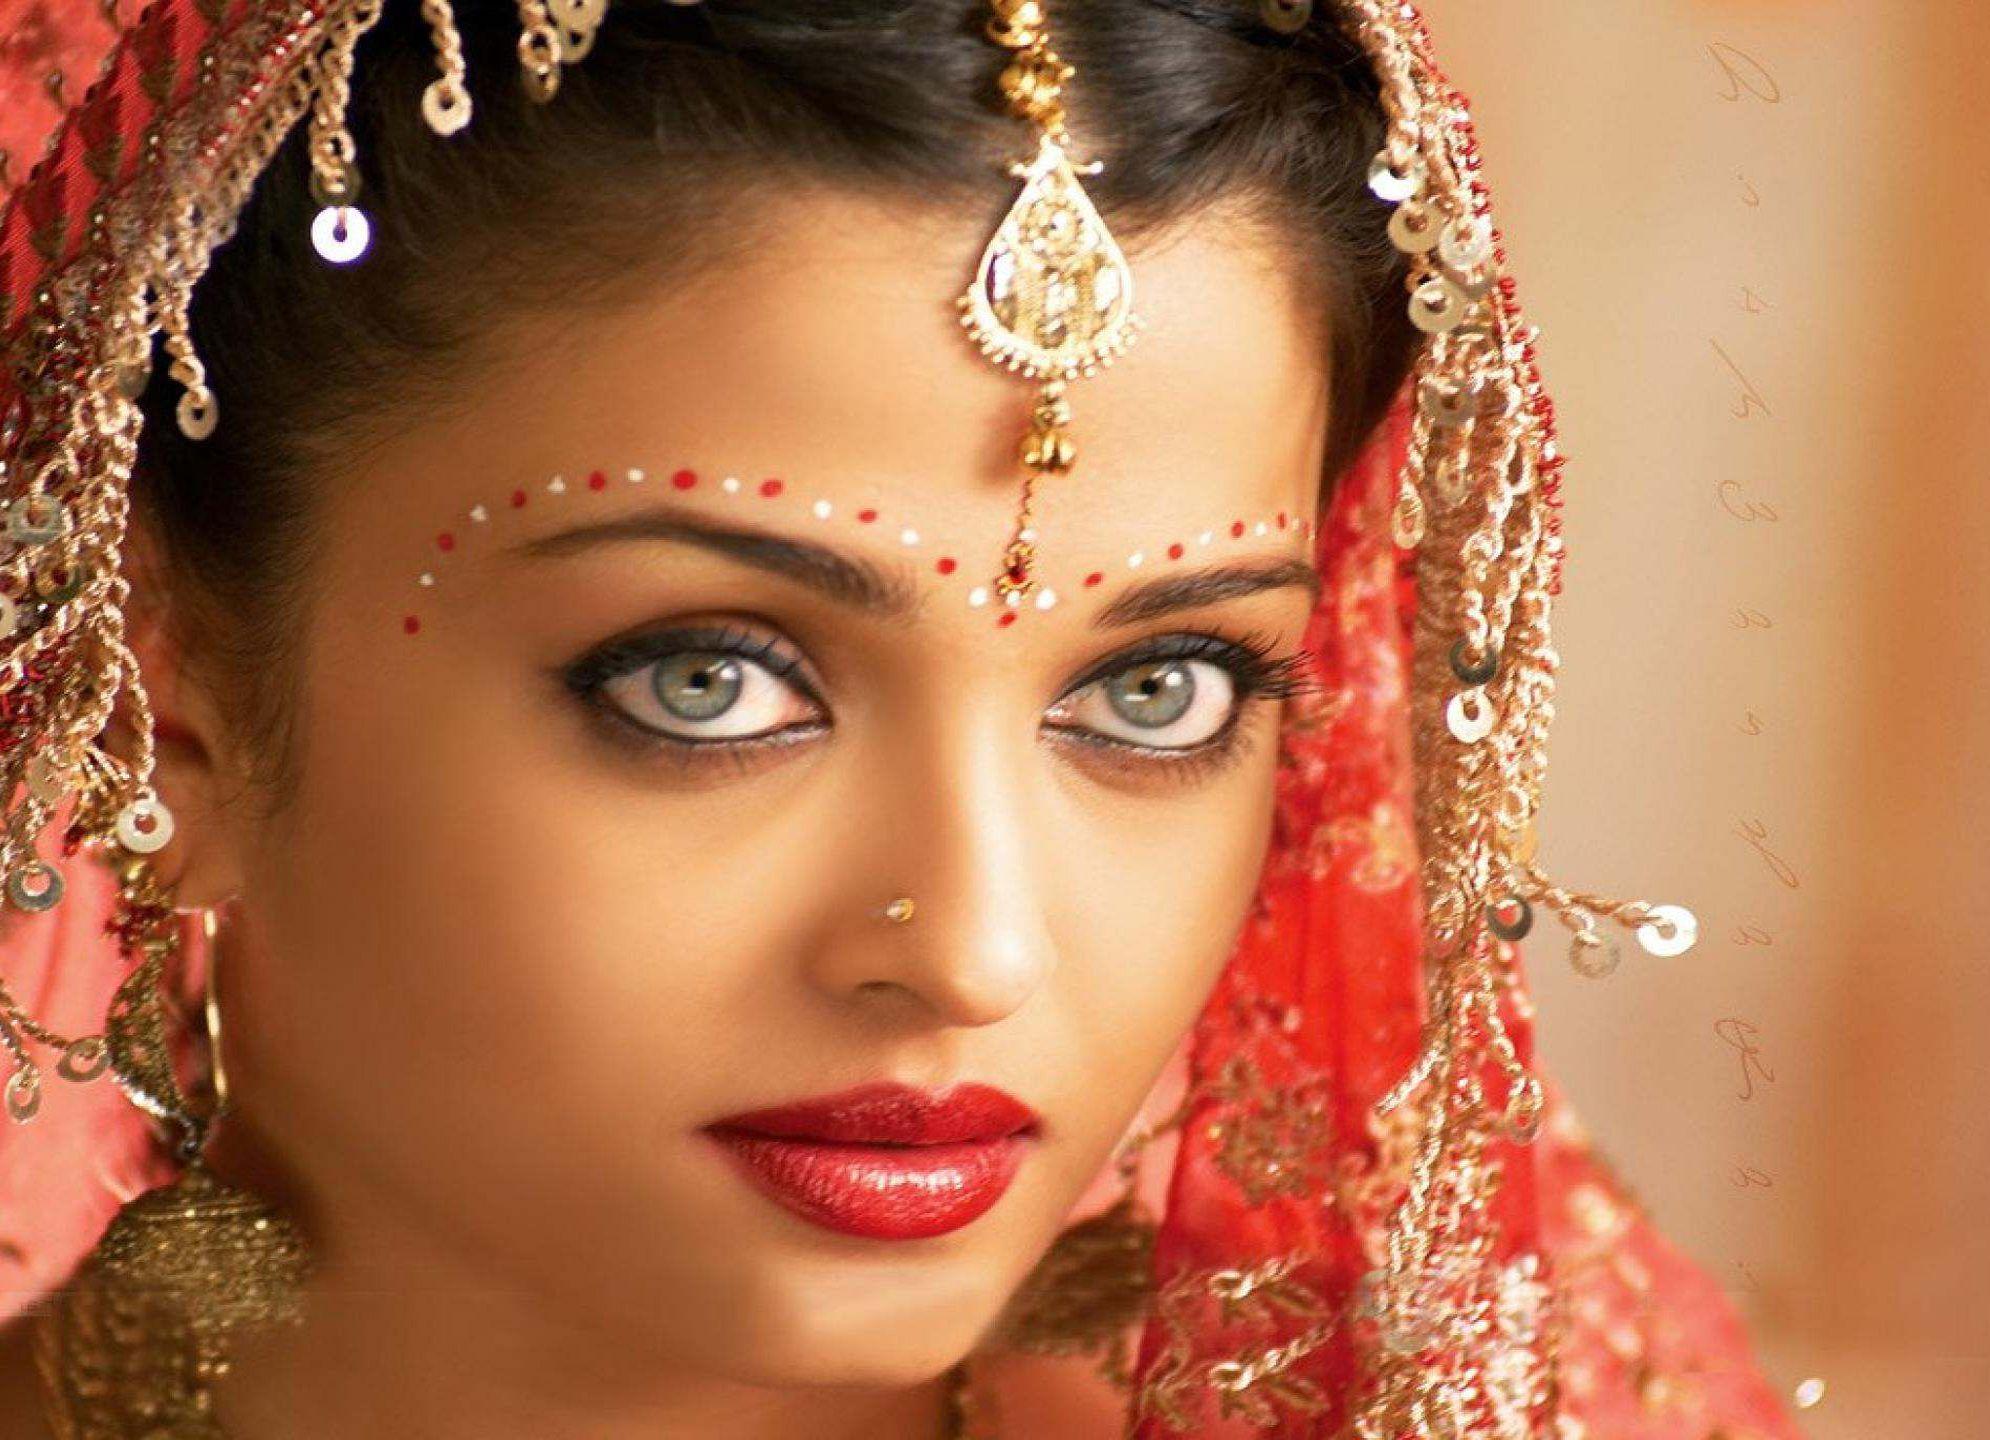 Aishwarya Rai Hd Wallpaper Download: Aishwarya Rai HD Wallpapers For Desktop Download